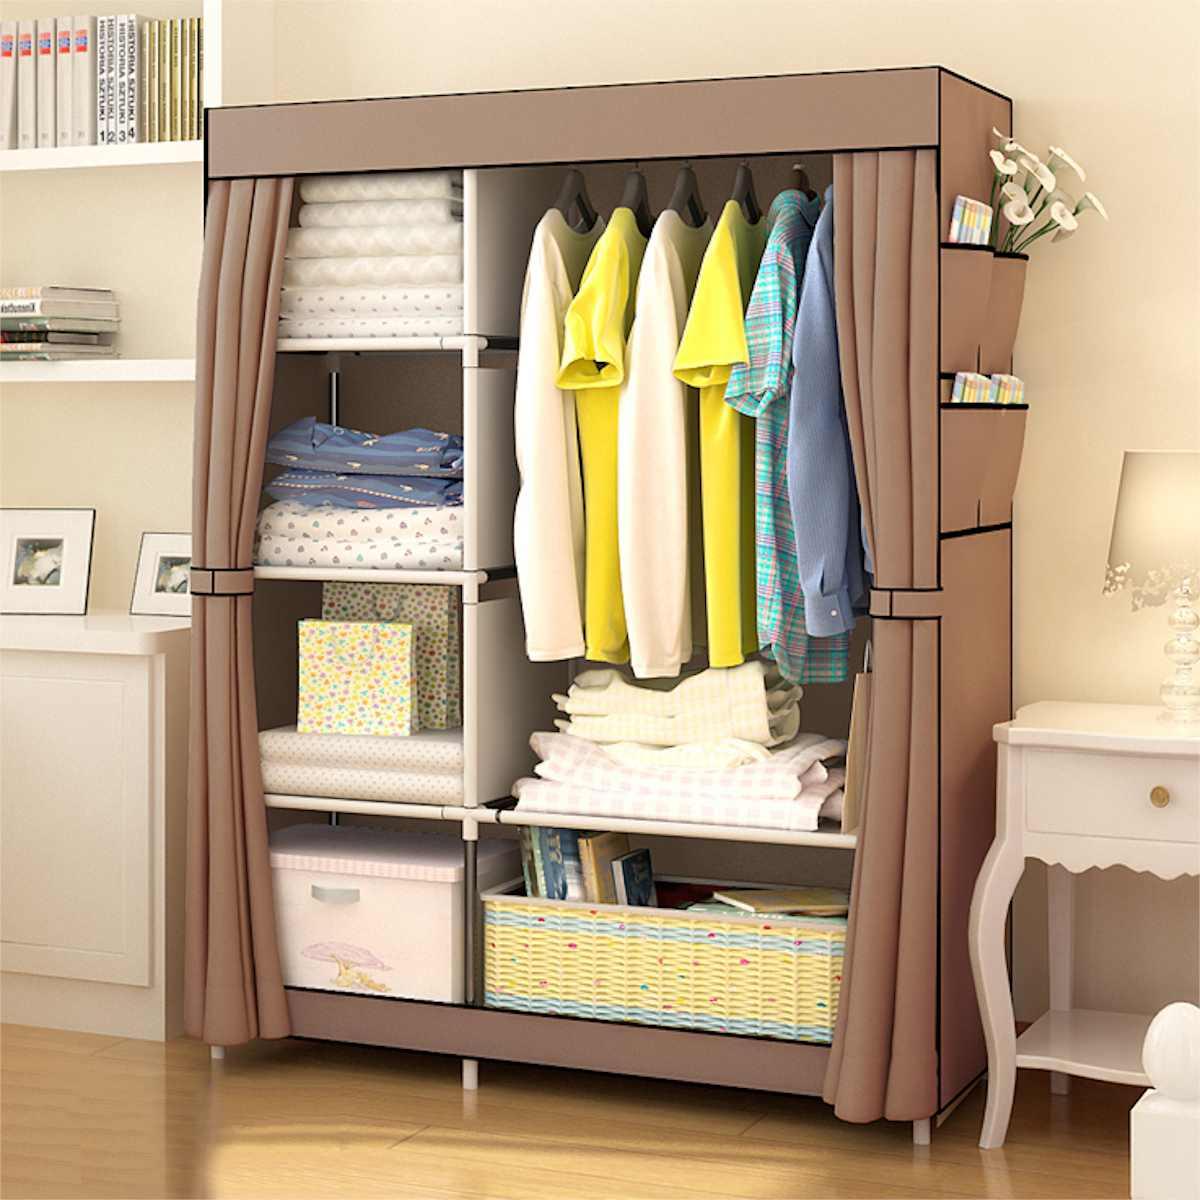 New 105x45x170cm Non woven Fabric Wardrobe Rack Holder DIY Assembly Storage Cabinet Storage Organizer Shelf Home